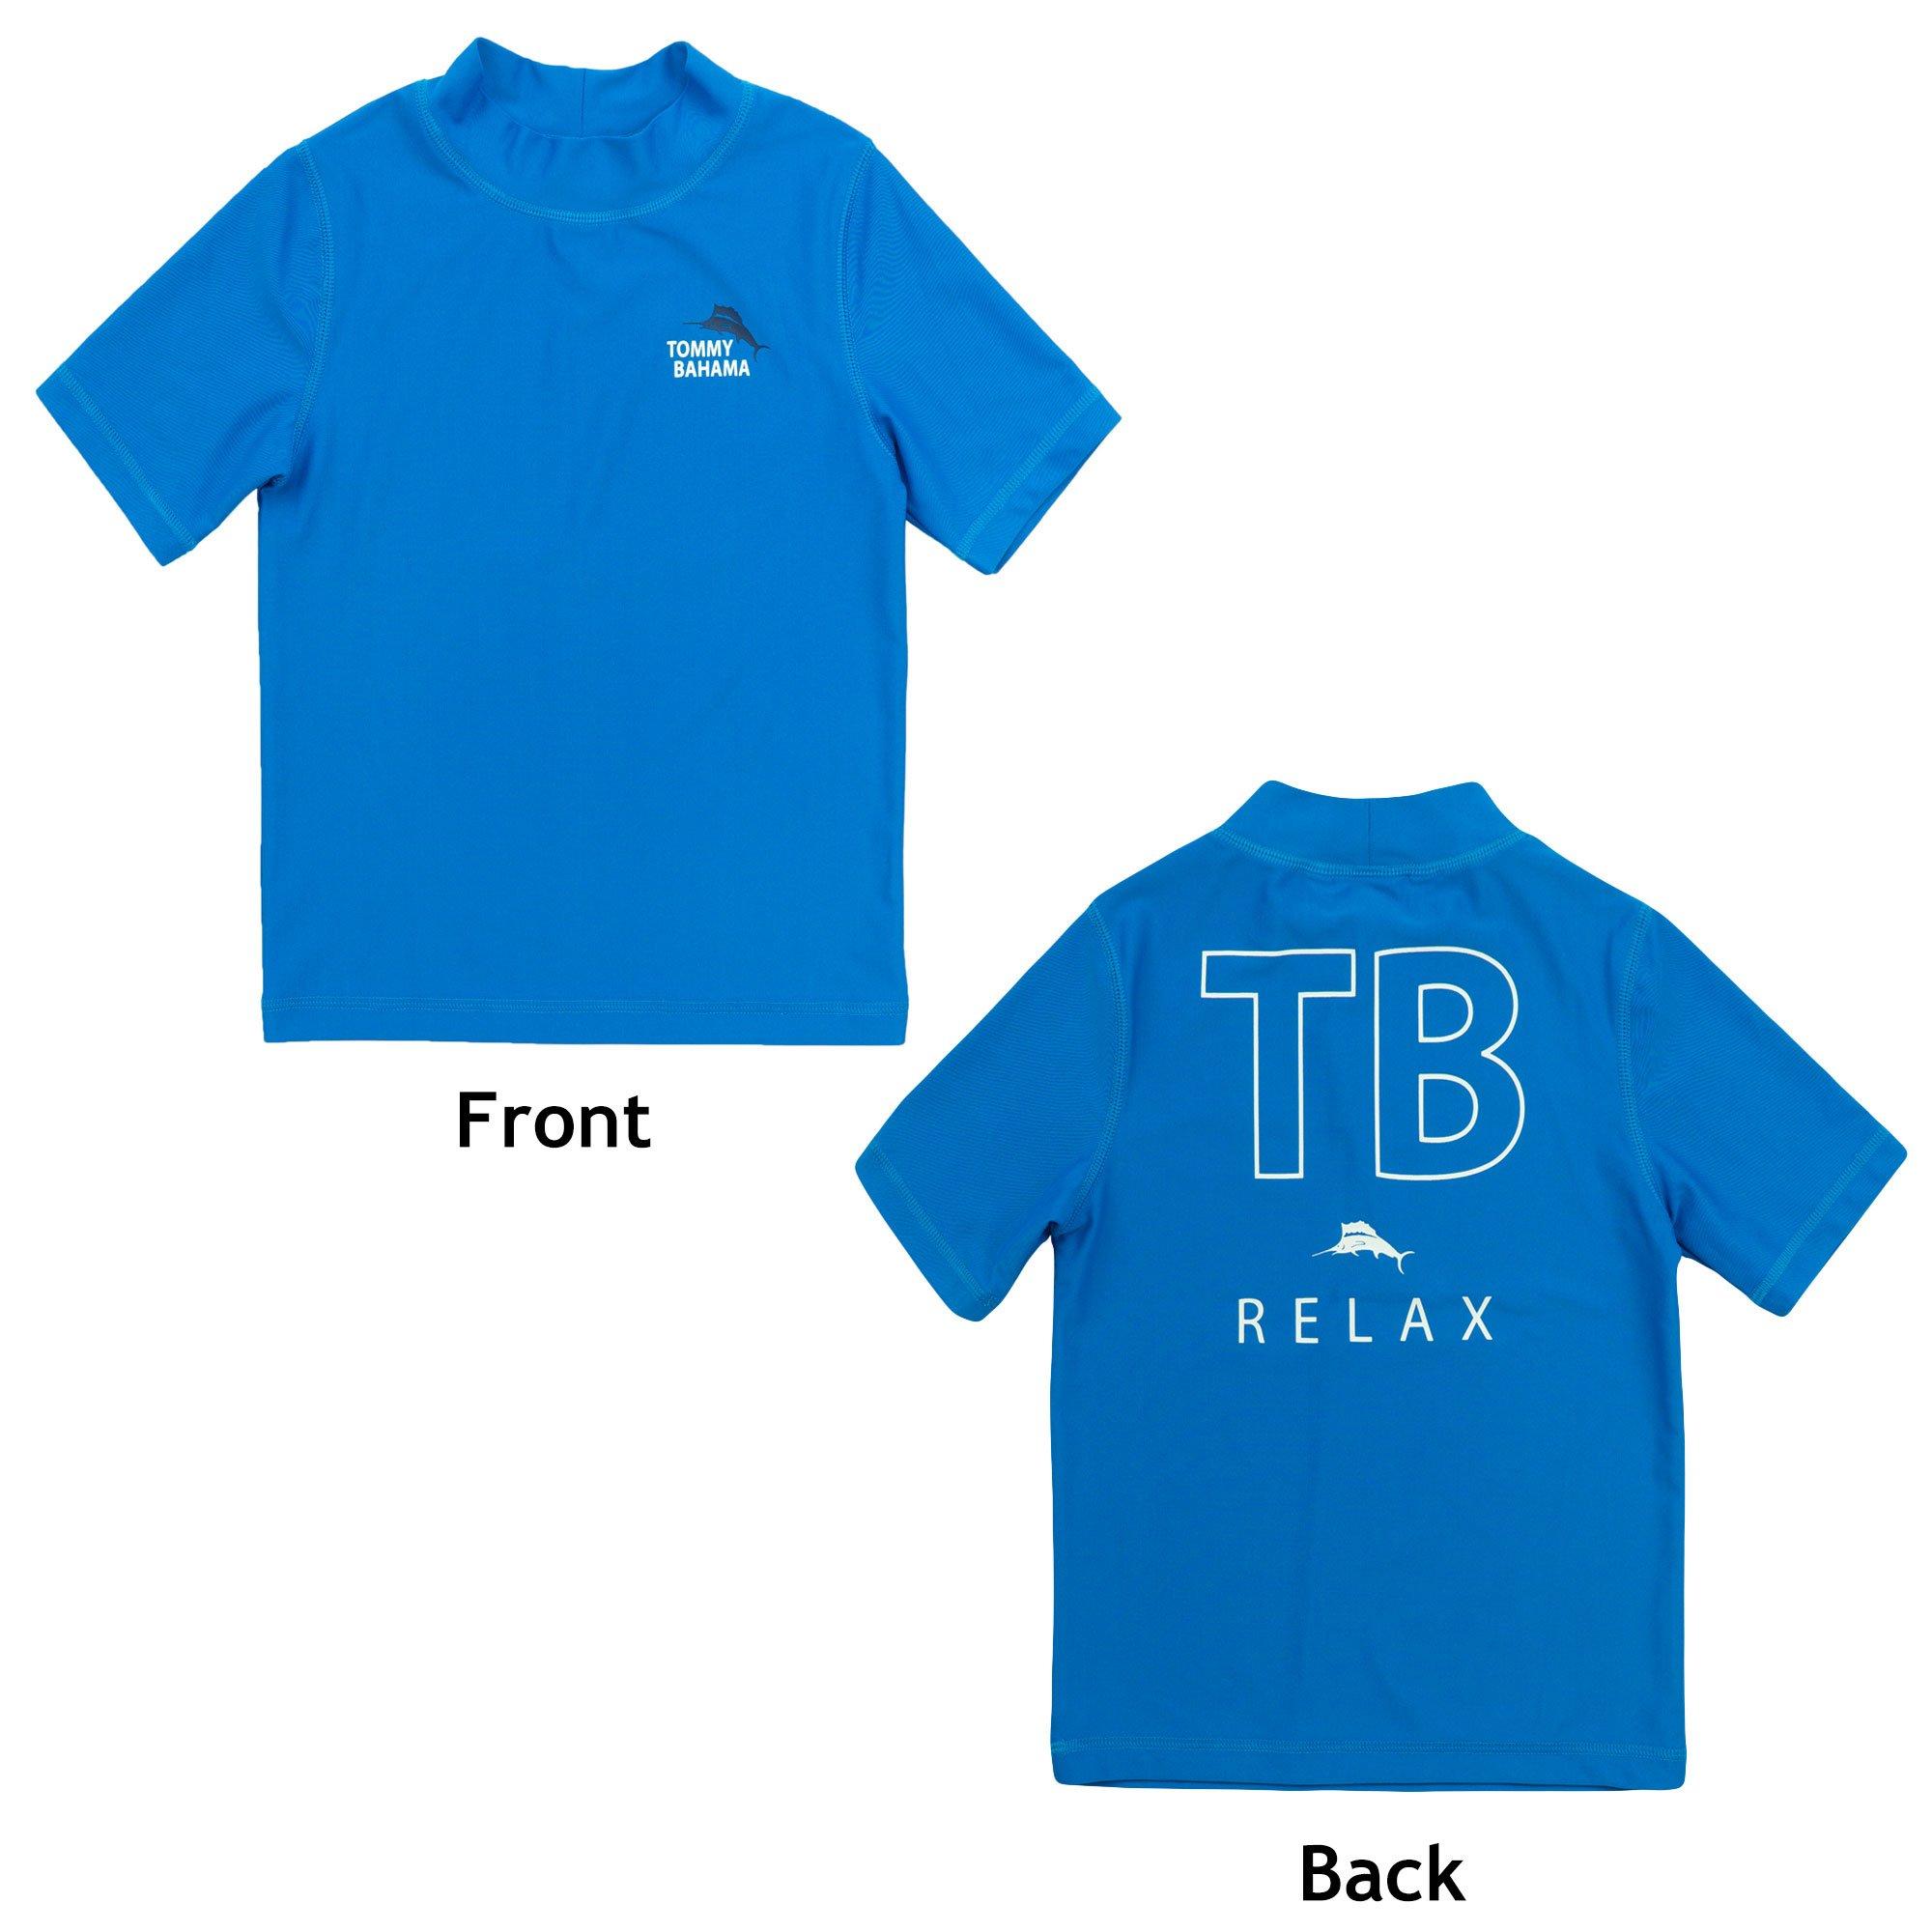 Tommy Bahama Boys Rash Guard Breathable Sun Protection Swim T-Shirt Blue and Beach Bag Large